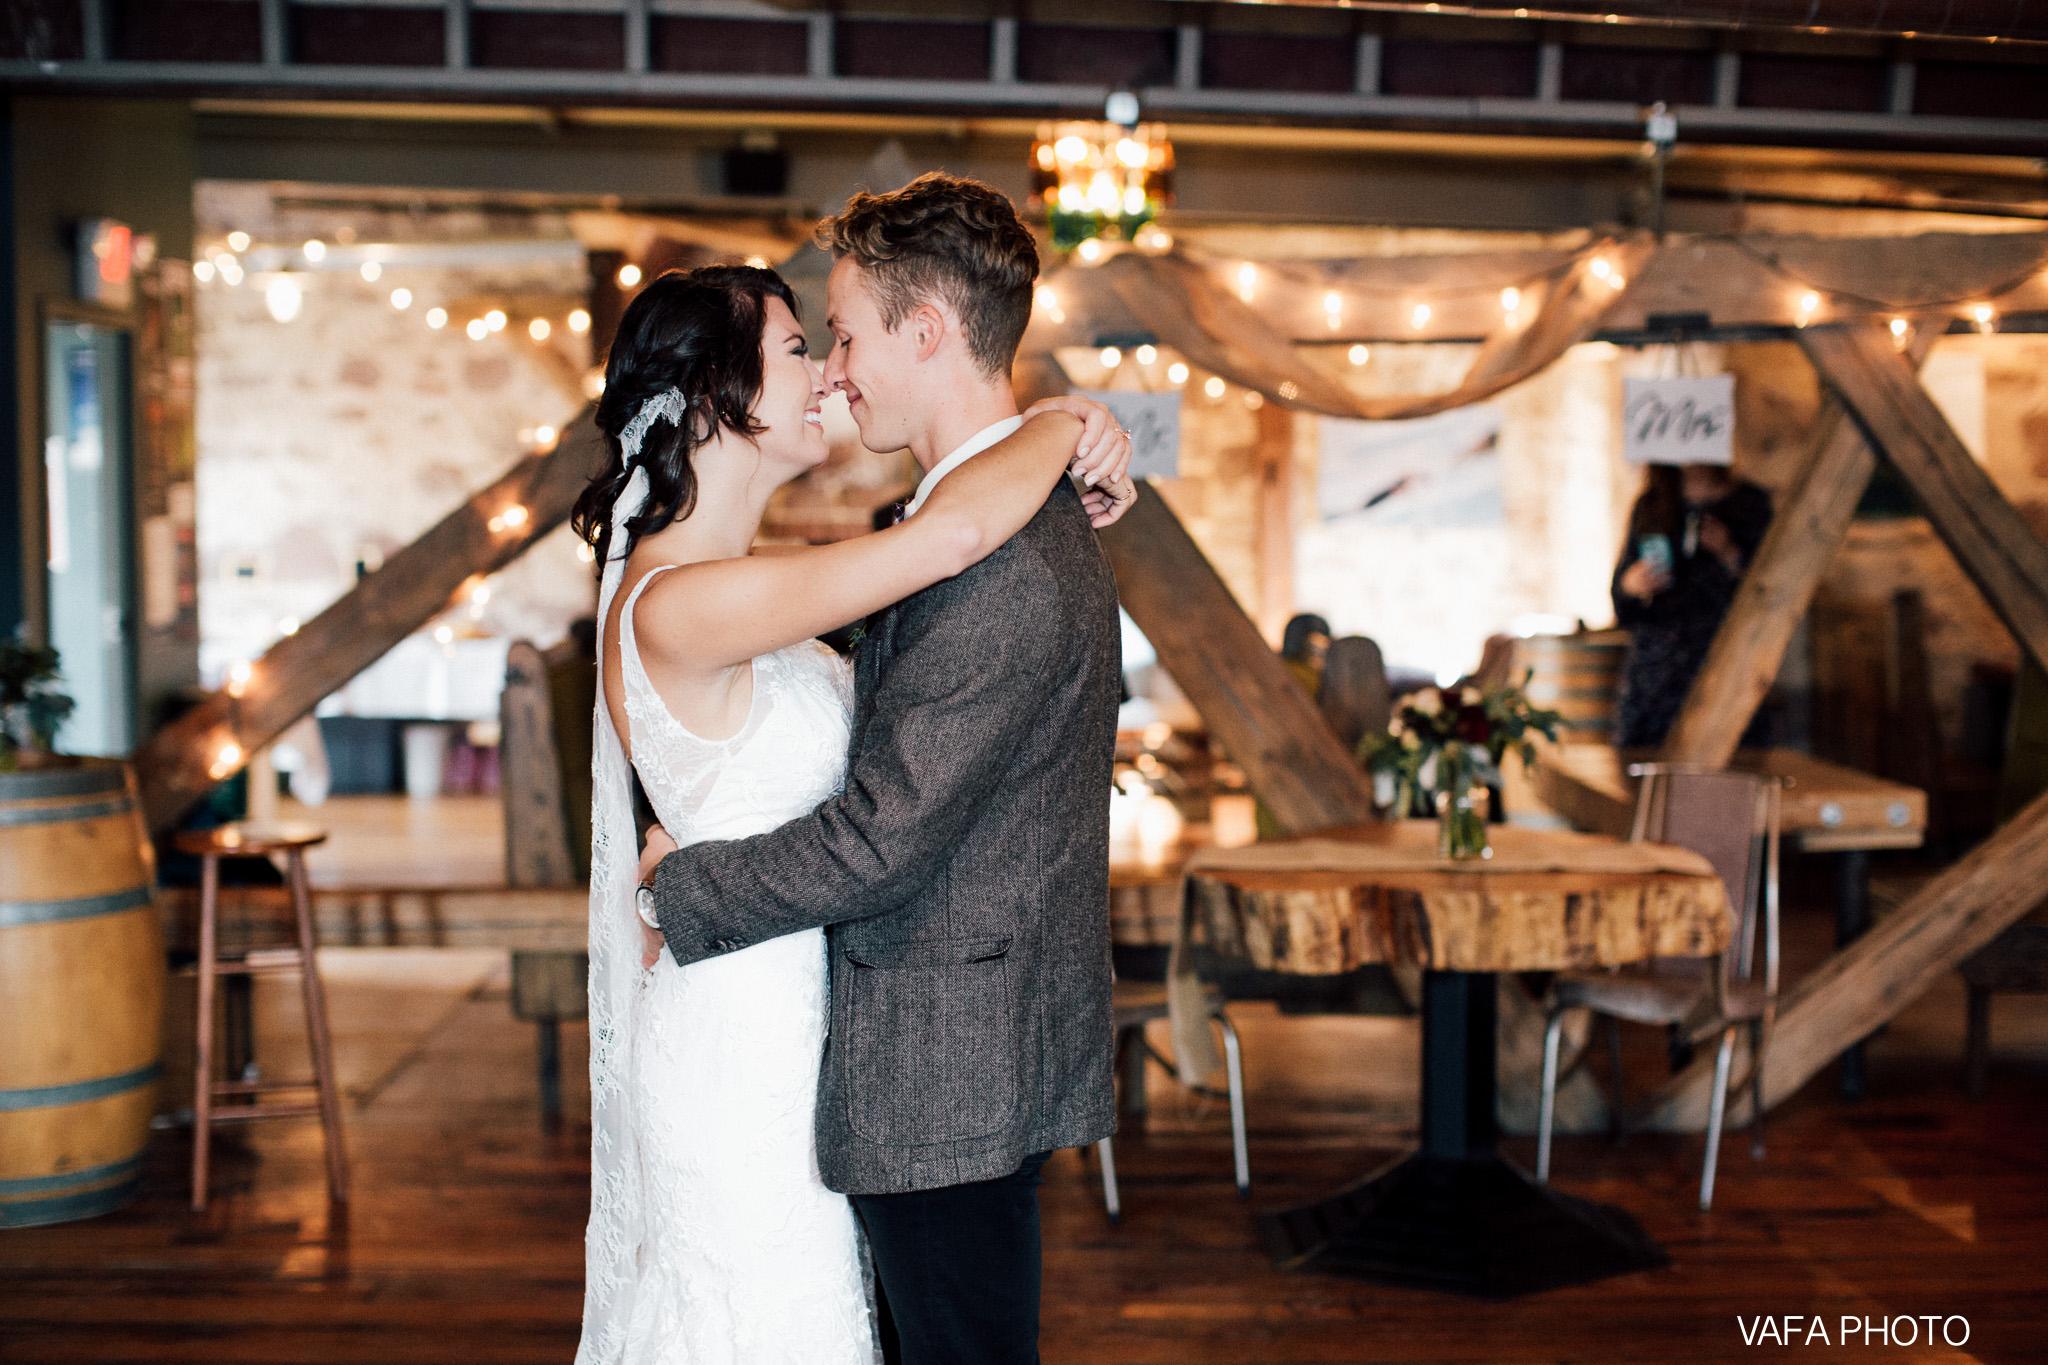 Hogback-Mountain-Wedding-Chelsea-Josh-Vafa-Photo-757.jpg